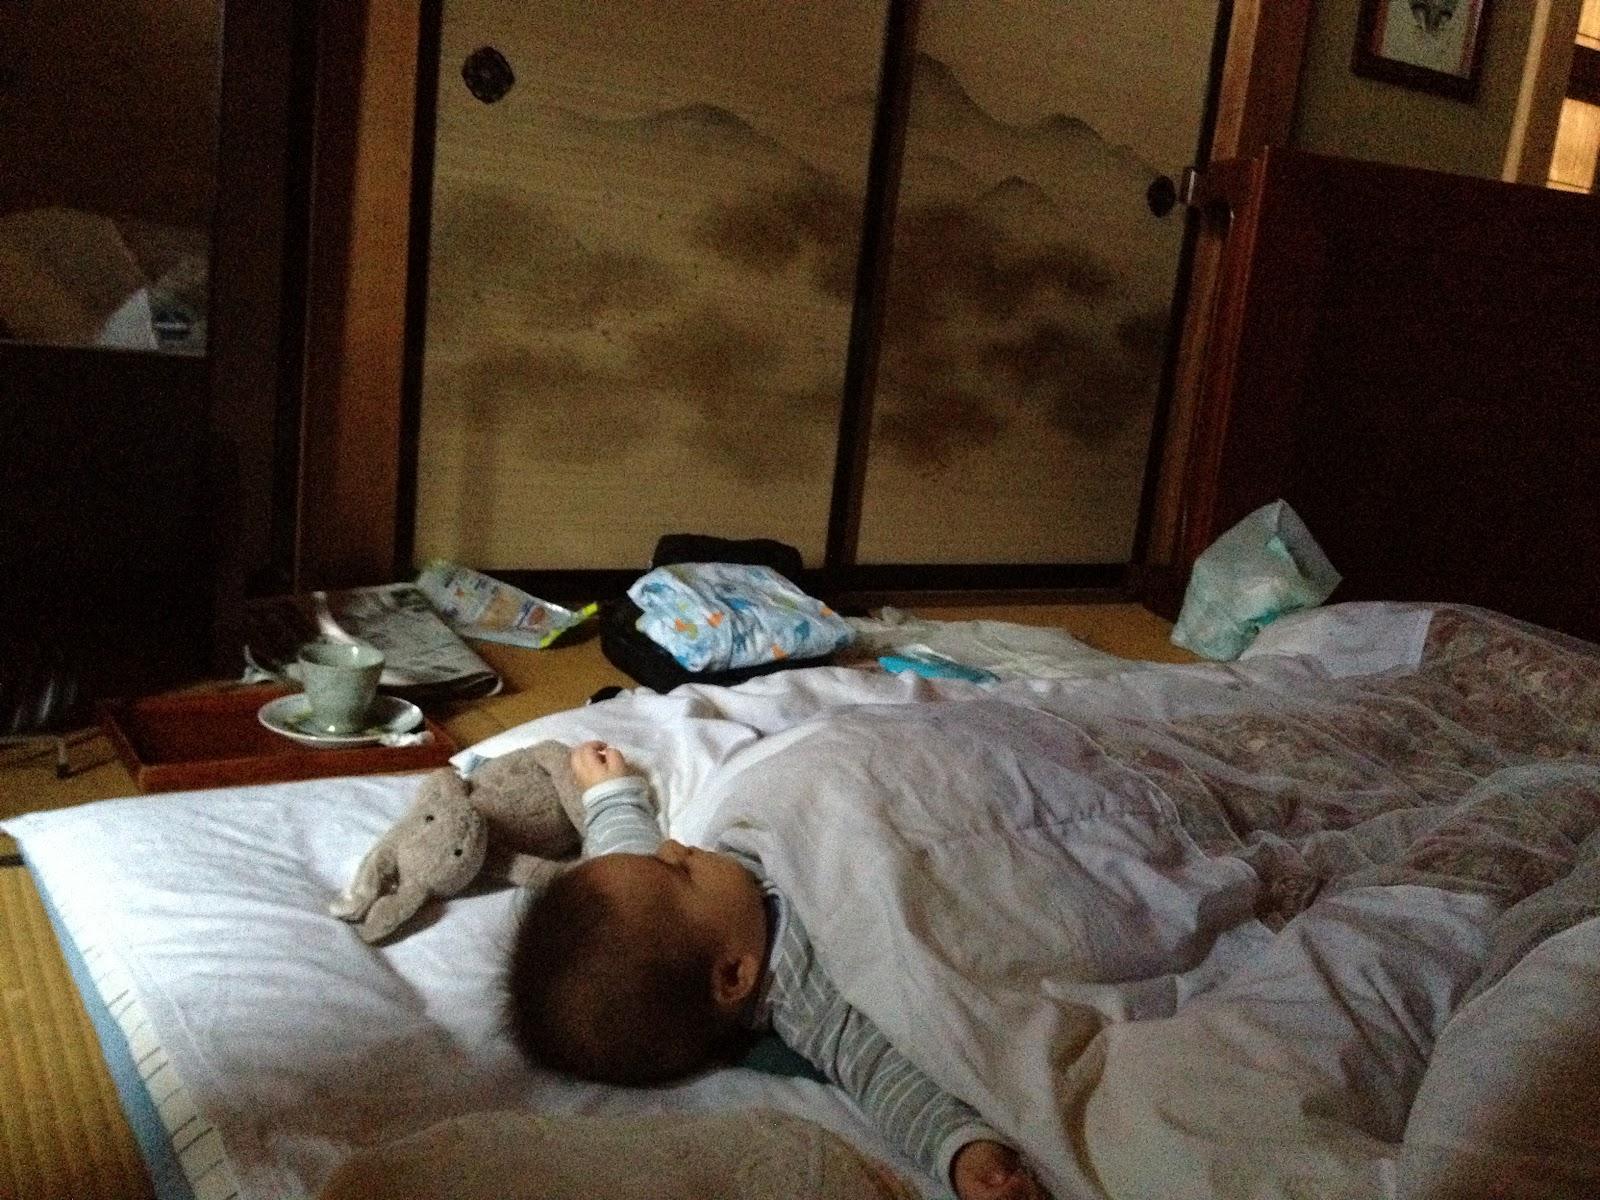 colors foam to sleep on futon memory comfortable walmart multiple mainstays com ip futons